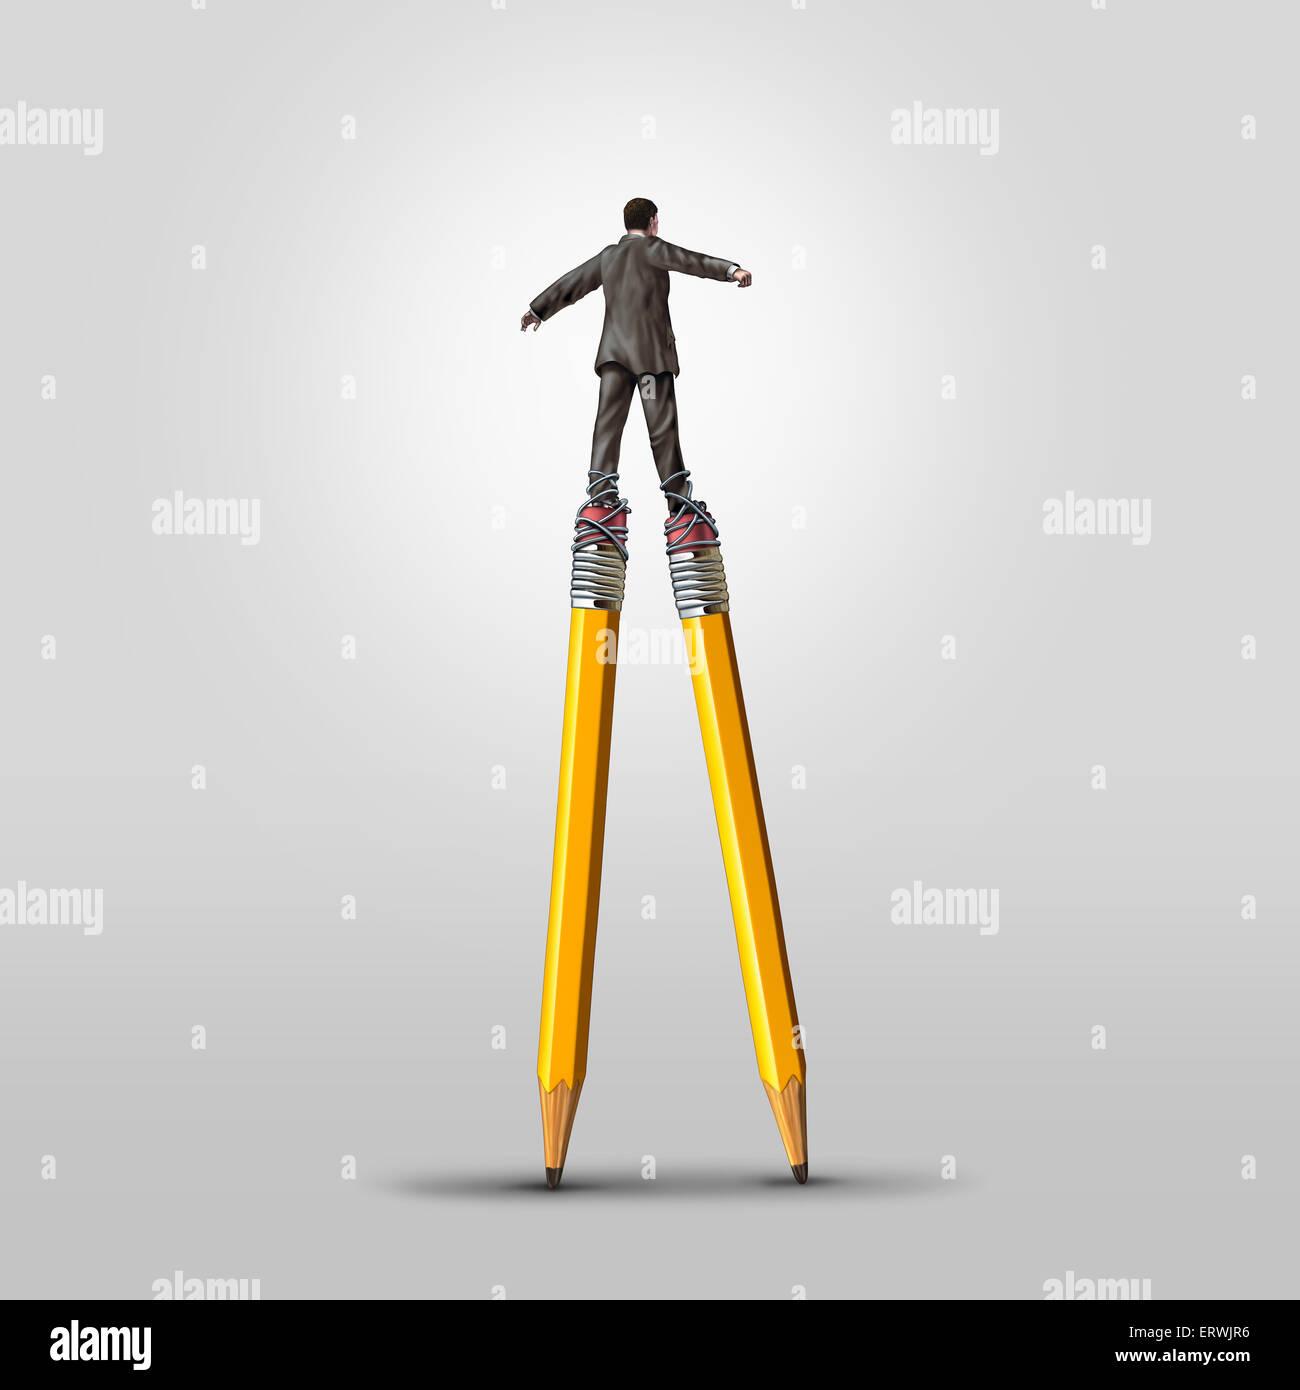 Concepto de habilidades creativas como un empresario inteligente equilibrio sobre altos pilotes lápiz adjunto Imagen De Stock